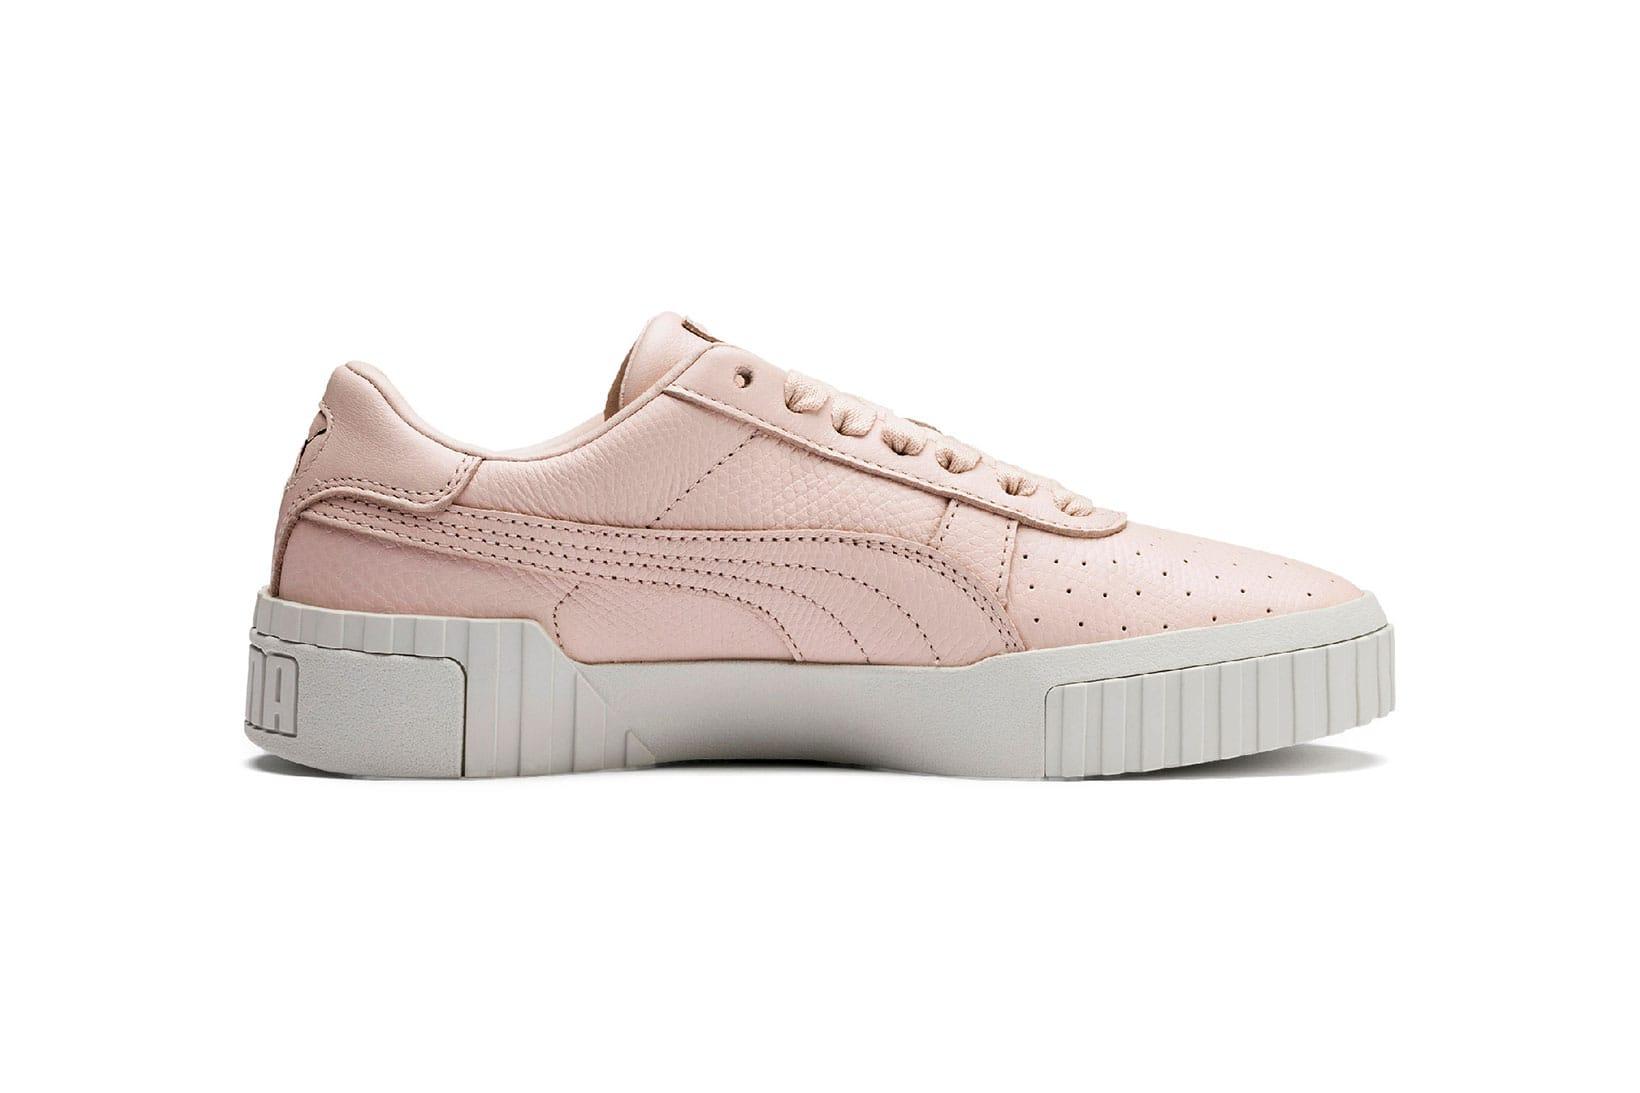 PUMA Releases Women's Cali Sneaker